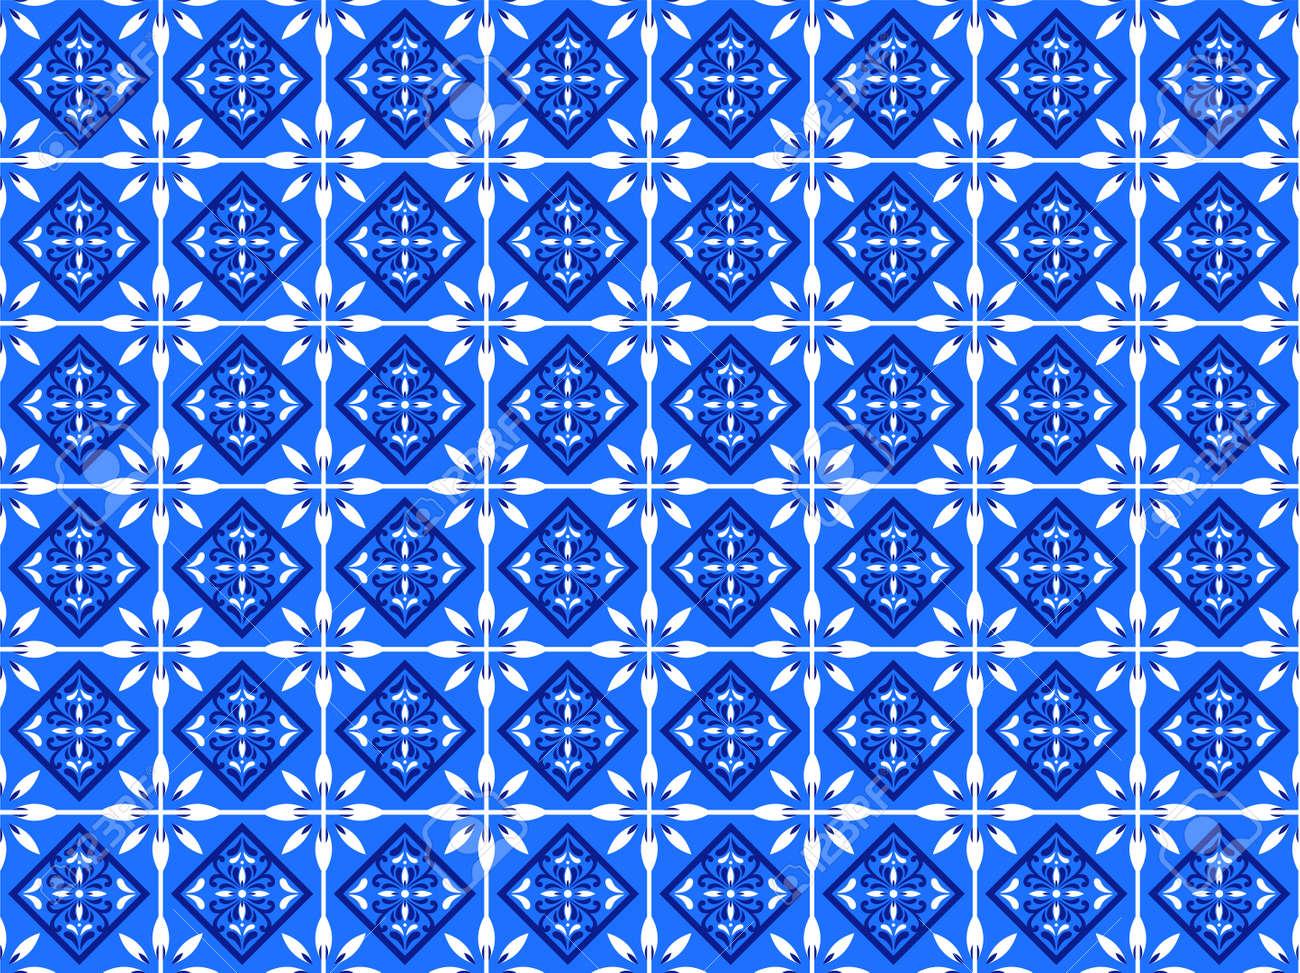 Azulejos Portuguese tile floor pattern - 173114923